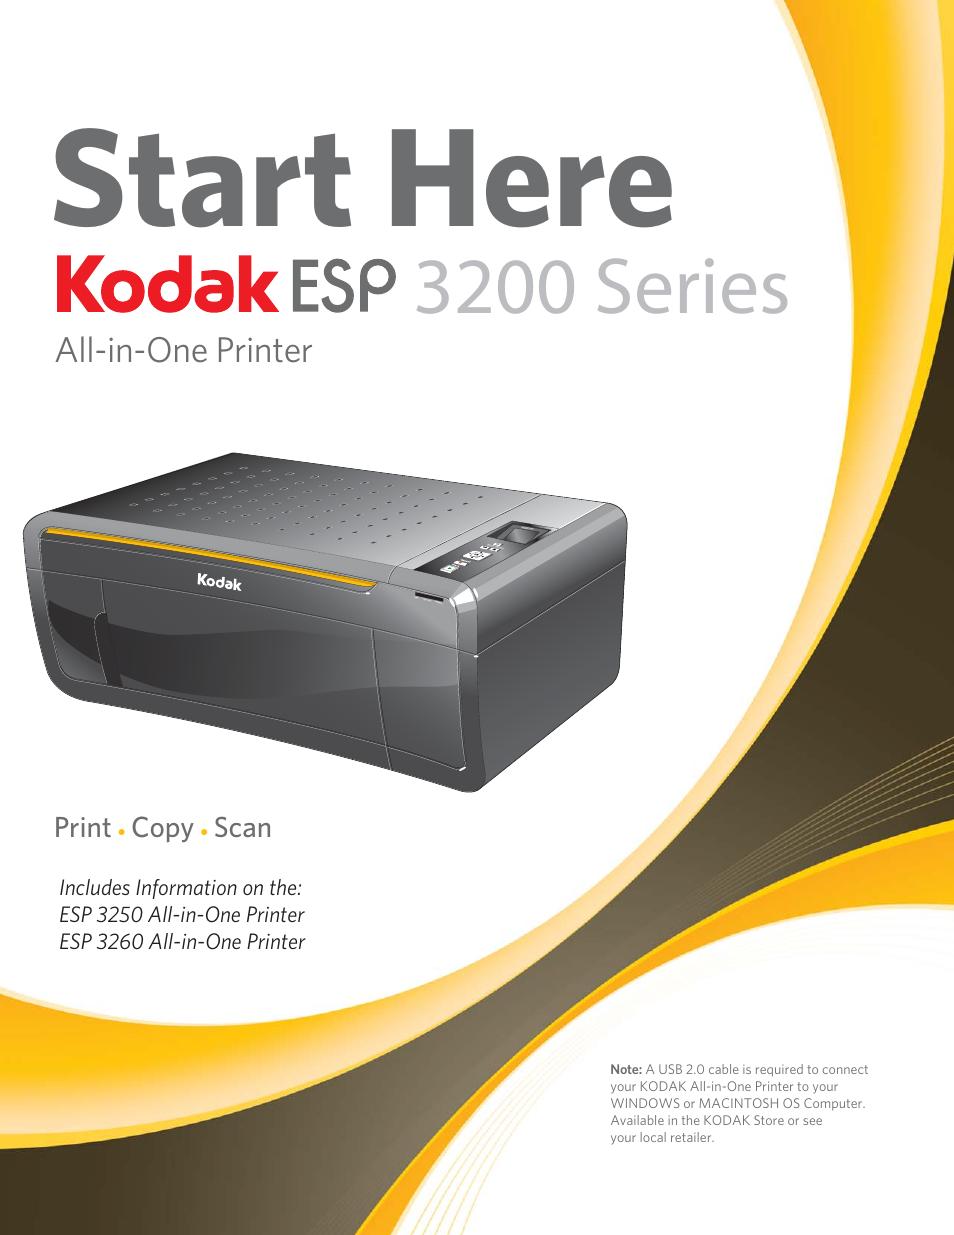 kodak esp 3200 user manual 12 pages also for esp 3250 rh manualsdir com kodak esp 3250 software download kodak esp 3250 software download for windows 7